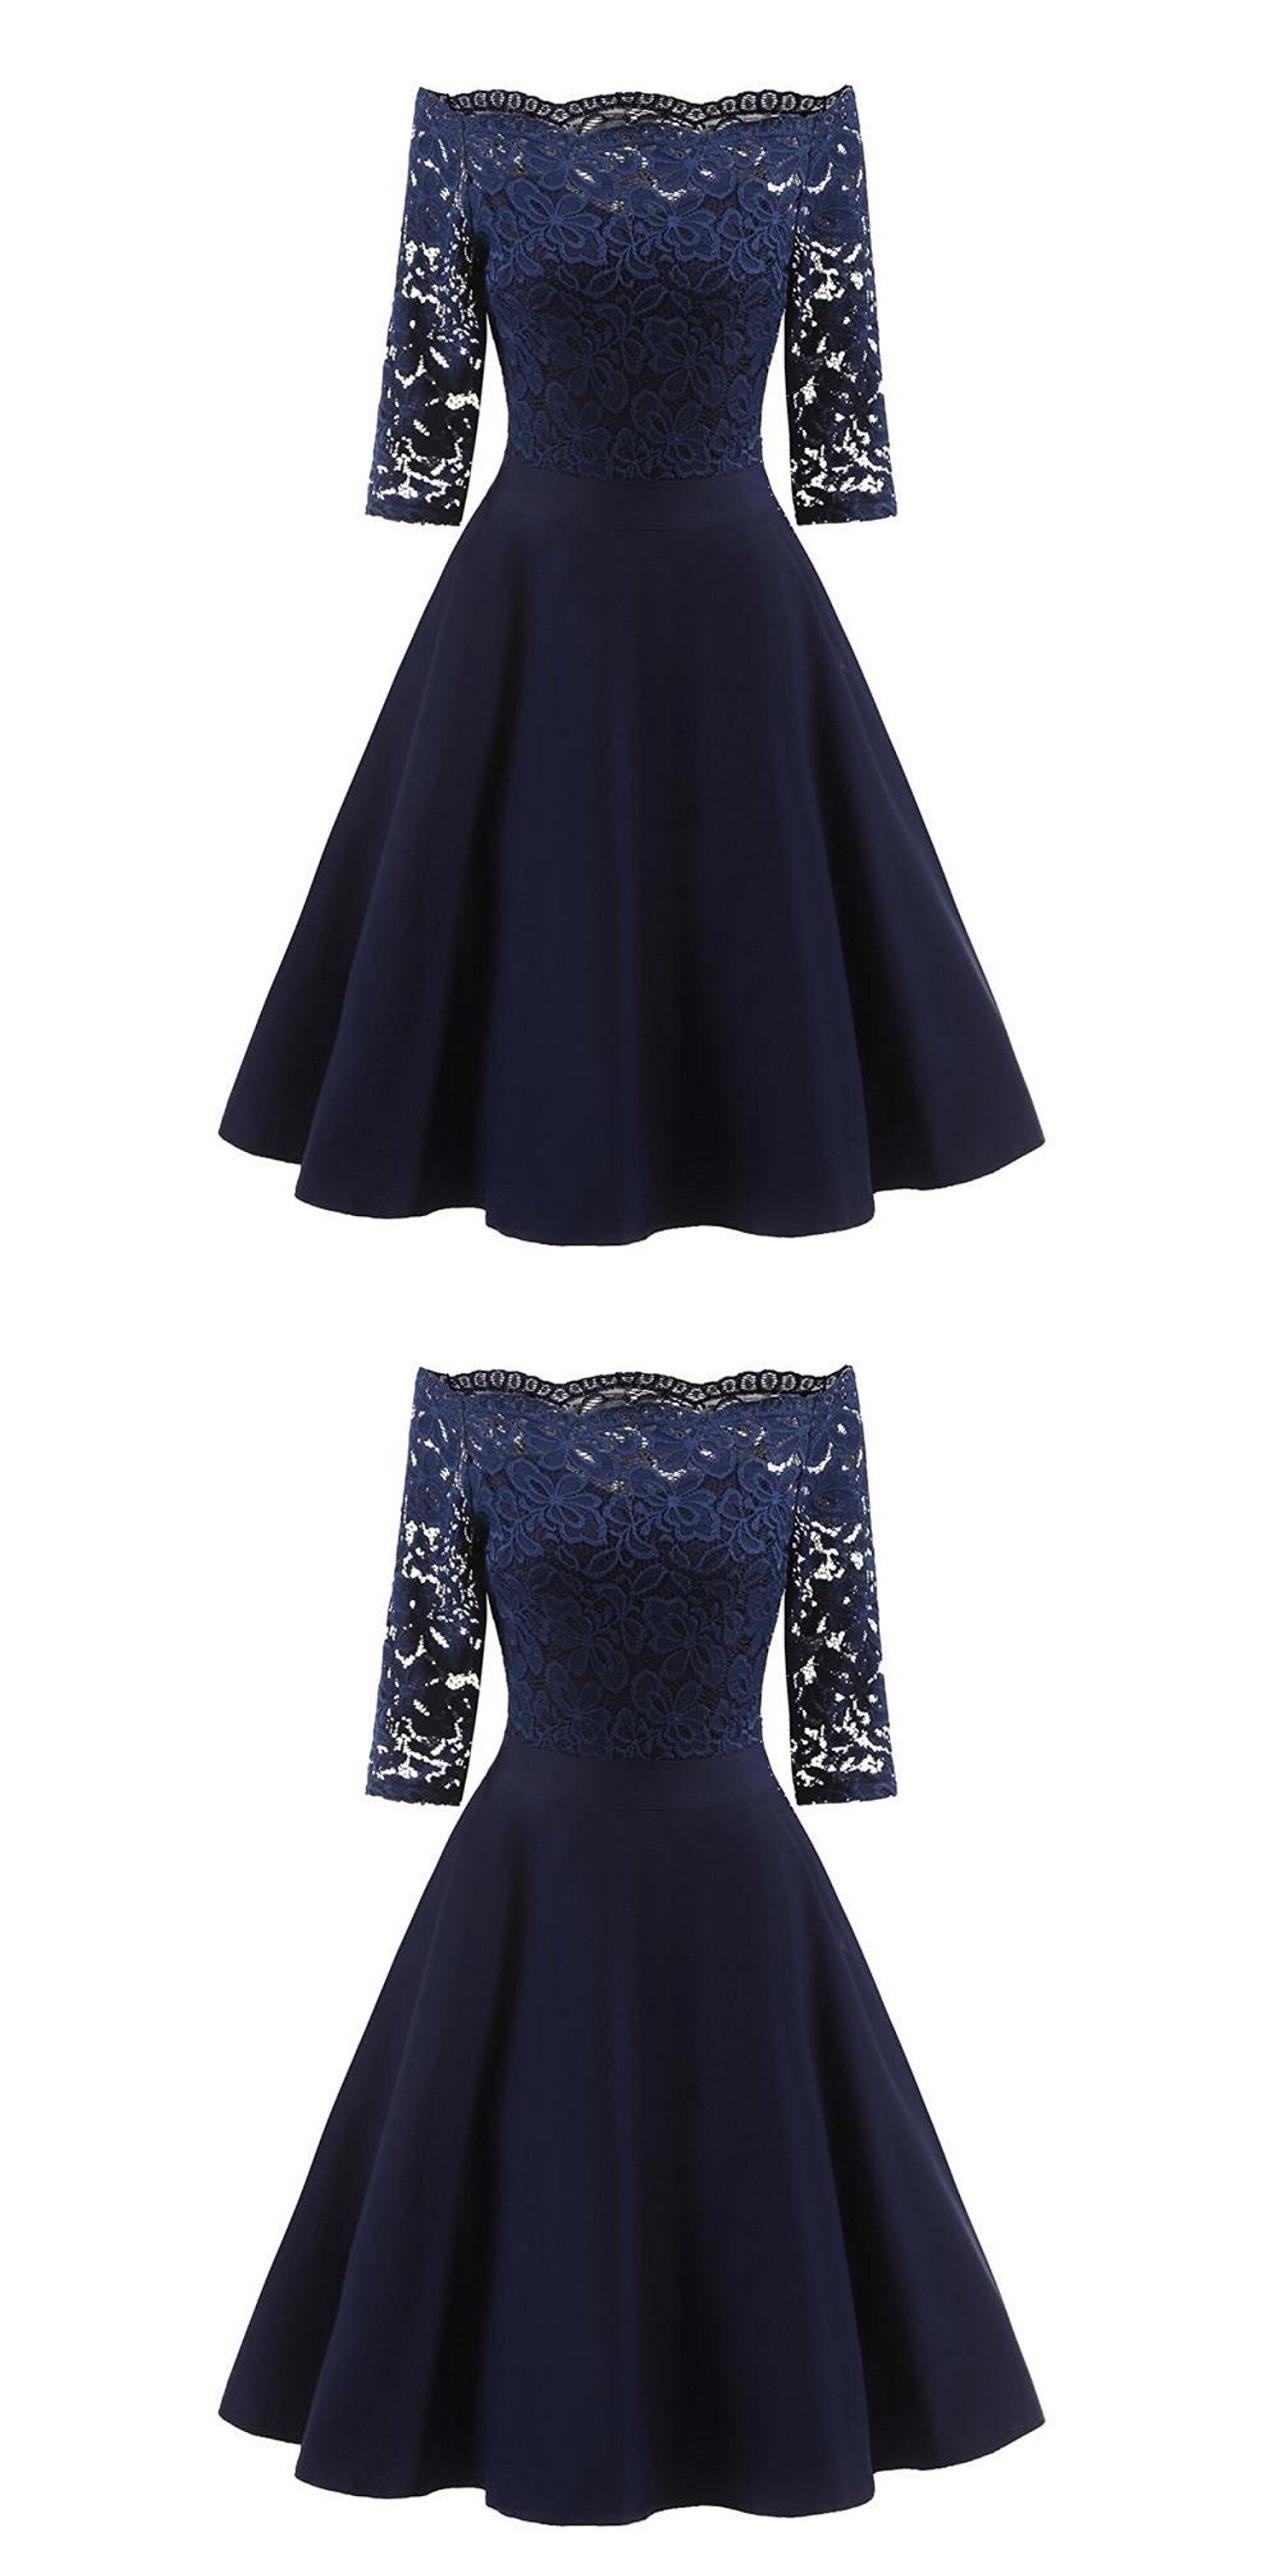 Perfect Navy Blue Homecoming Dress,Off The Shoulder Short Prom Dress,A-Line Graduation Dress,Custom Made Cheap Party Dress #navyblueshortdress